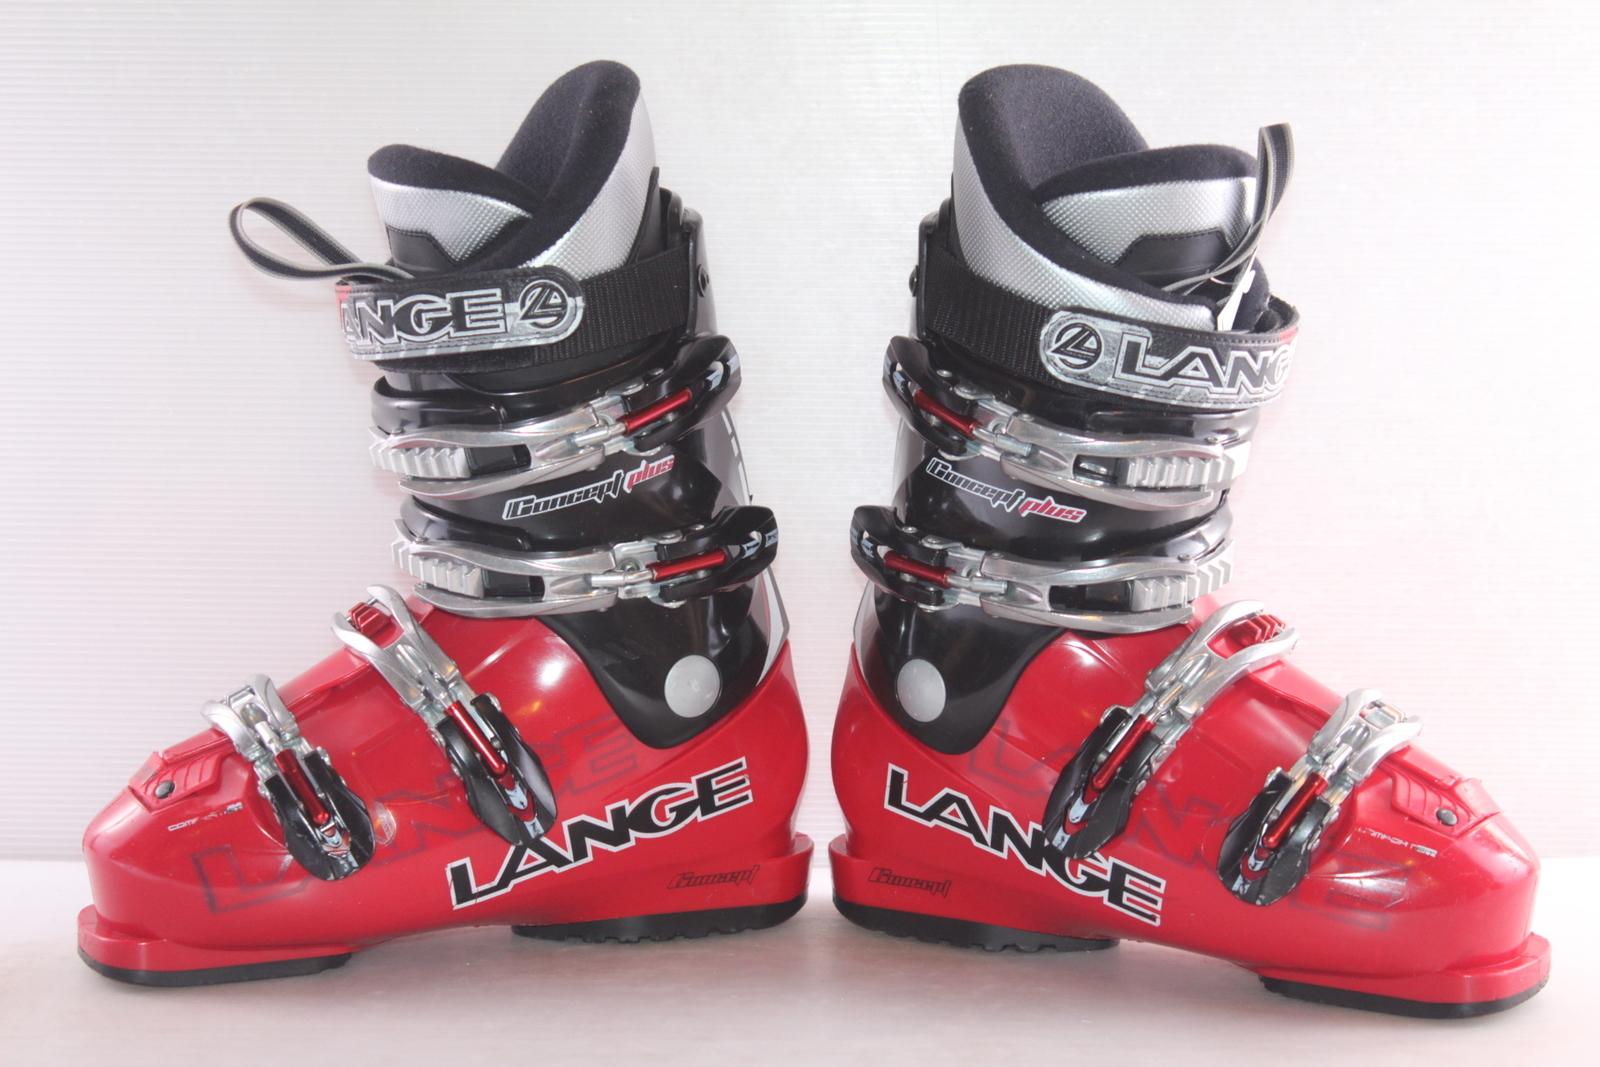 Lyžařské boty Lange Concept plus vel. EU38.5 flexe 90